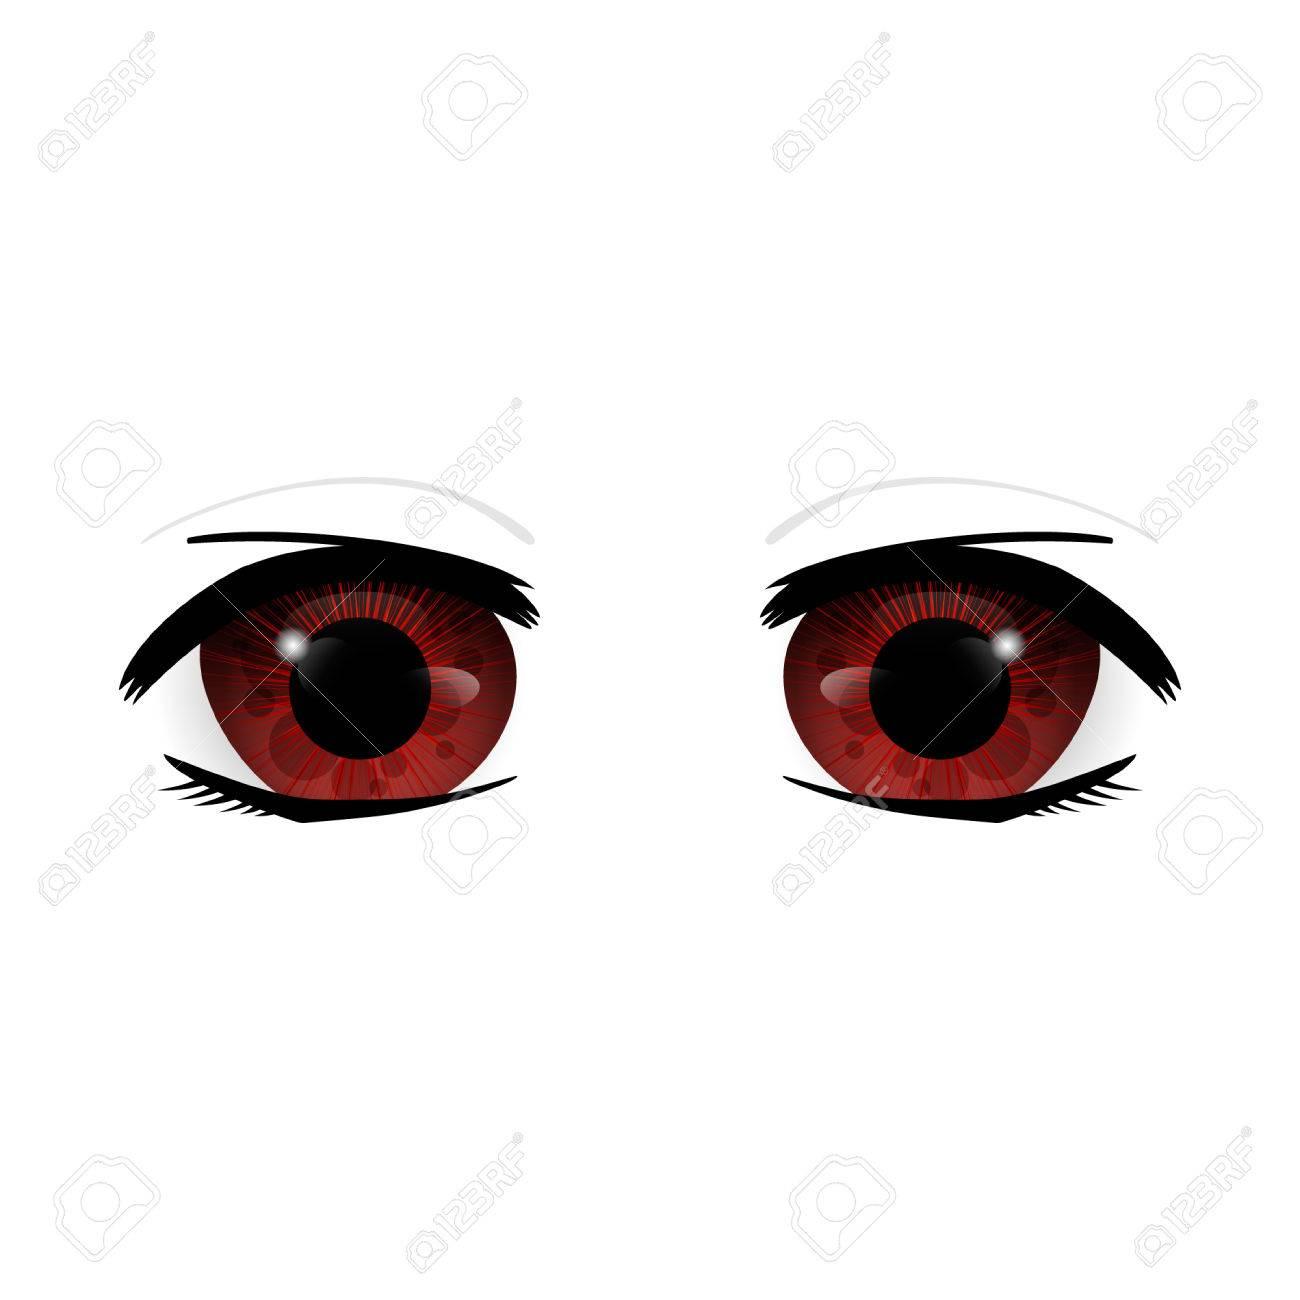 Anime Eyes Human Eyes Closeup Beautiful Big Cartoon Eyes Illustration Stock Photo Picture And Royalty Free Image Image 81800044